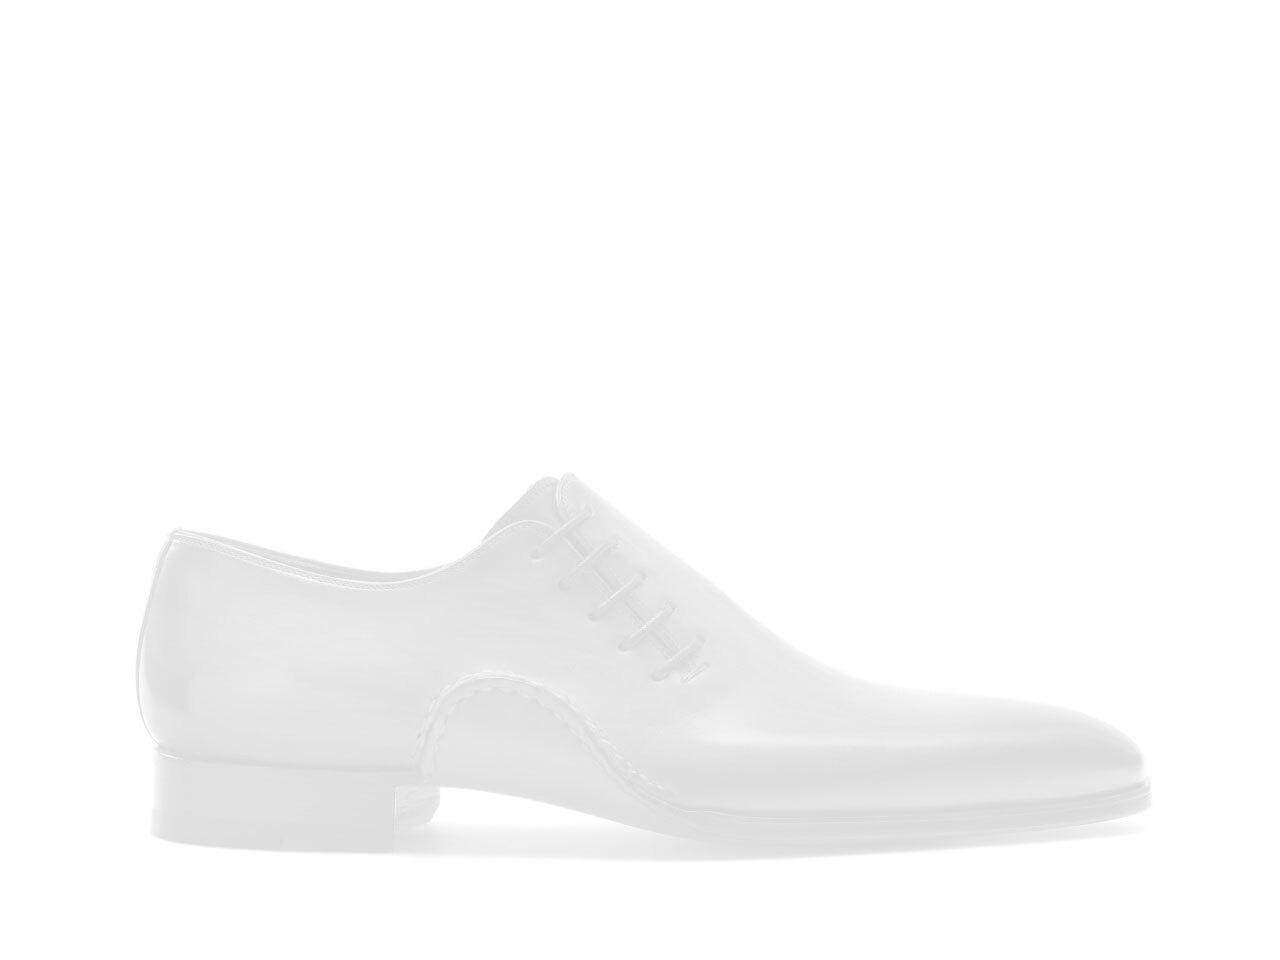 Sole of the Magnanni Islaro Cuero Men's Double Monk Strap Shoes